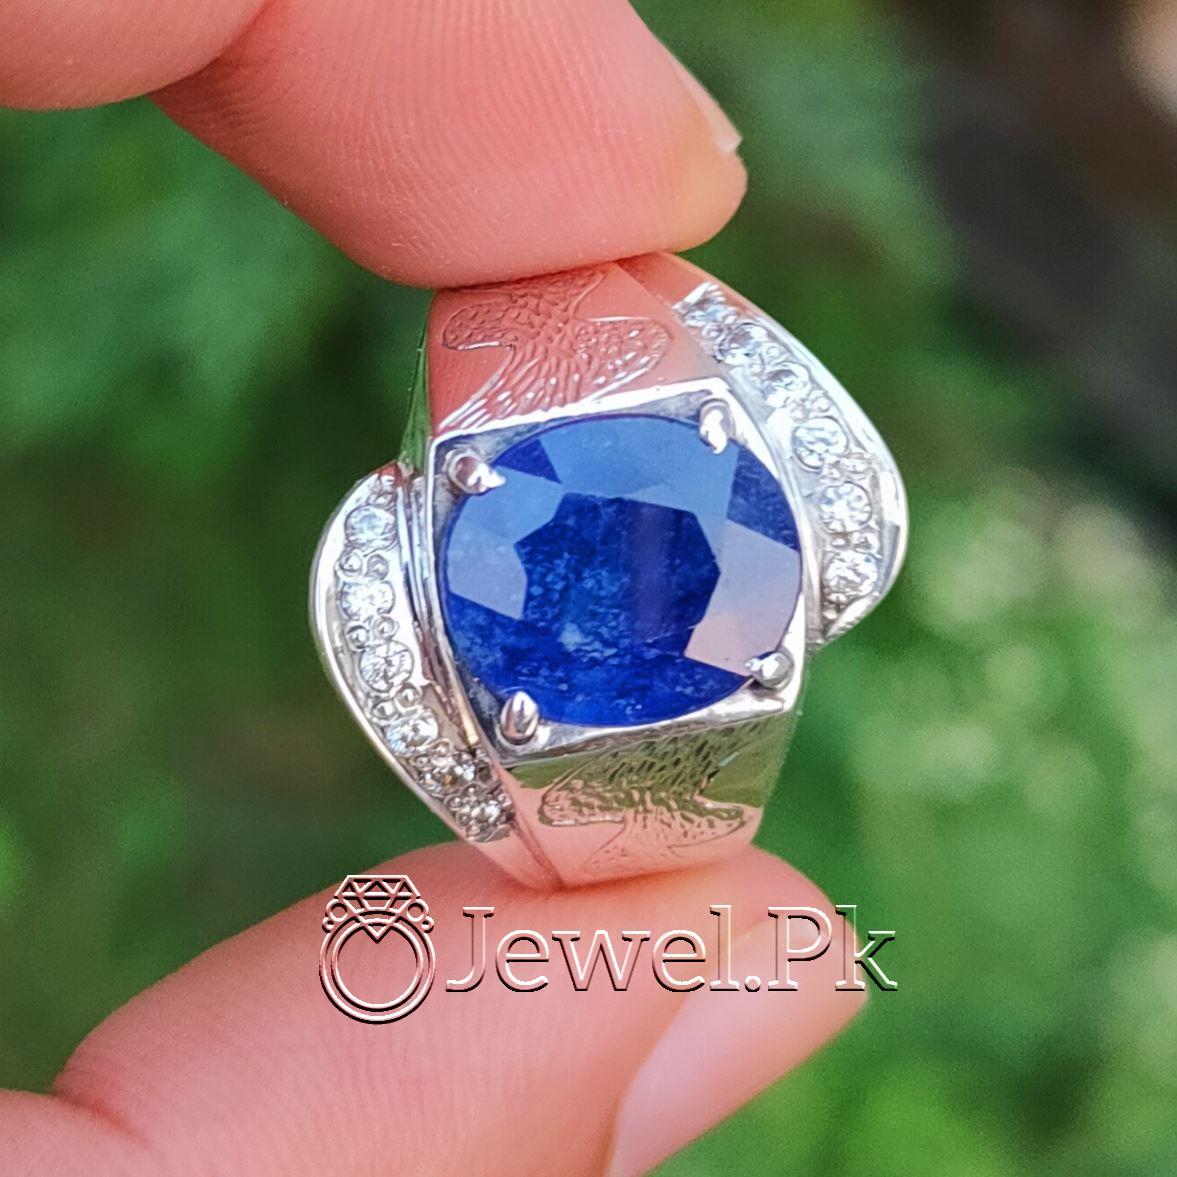 Natural Blue Sapphire Ring 925 Silver Chandi Handmade 1 natural gemstones pakistan + 925 silver jewelry online